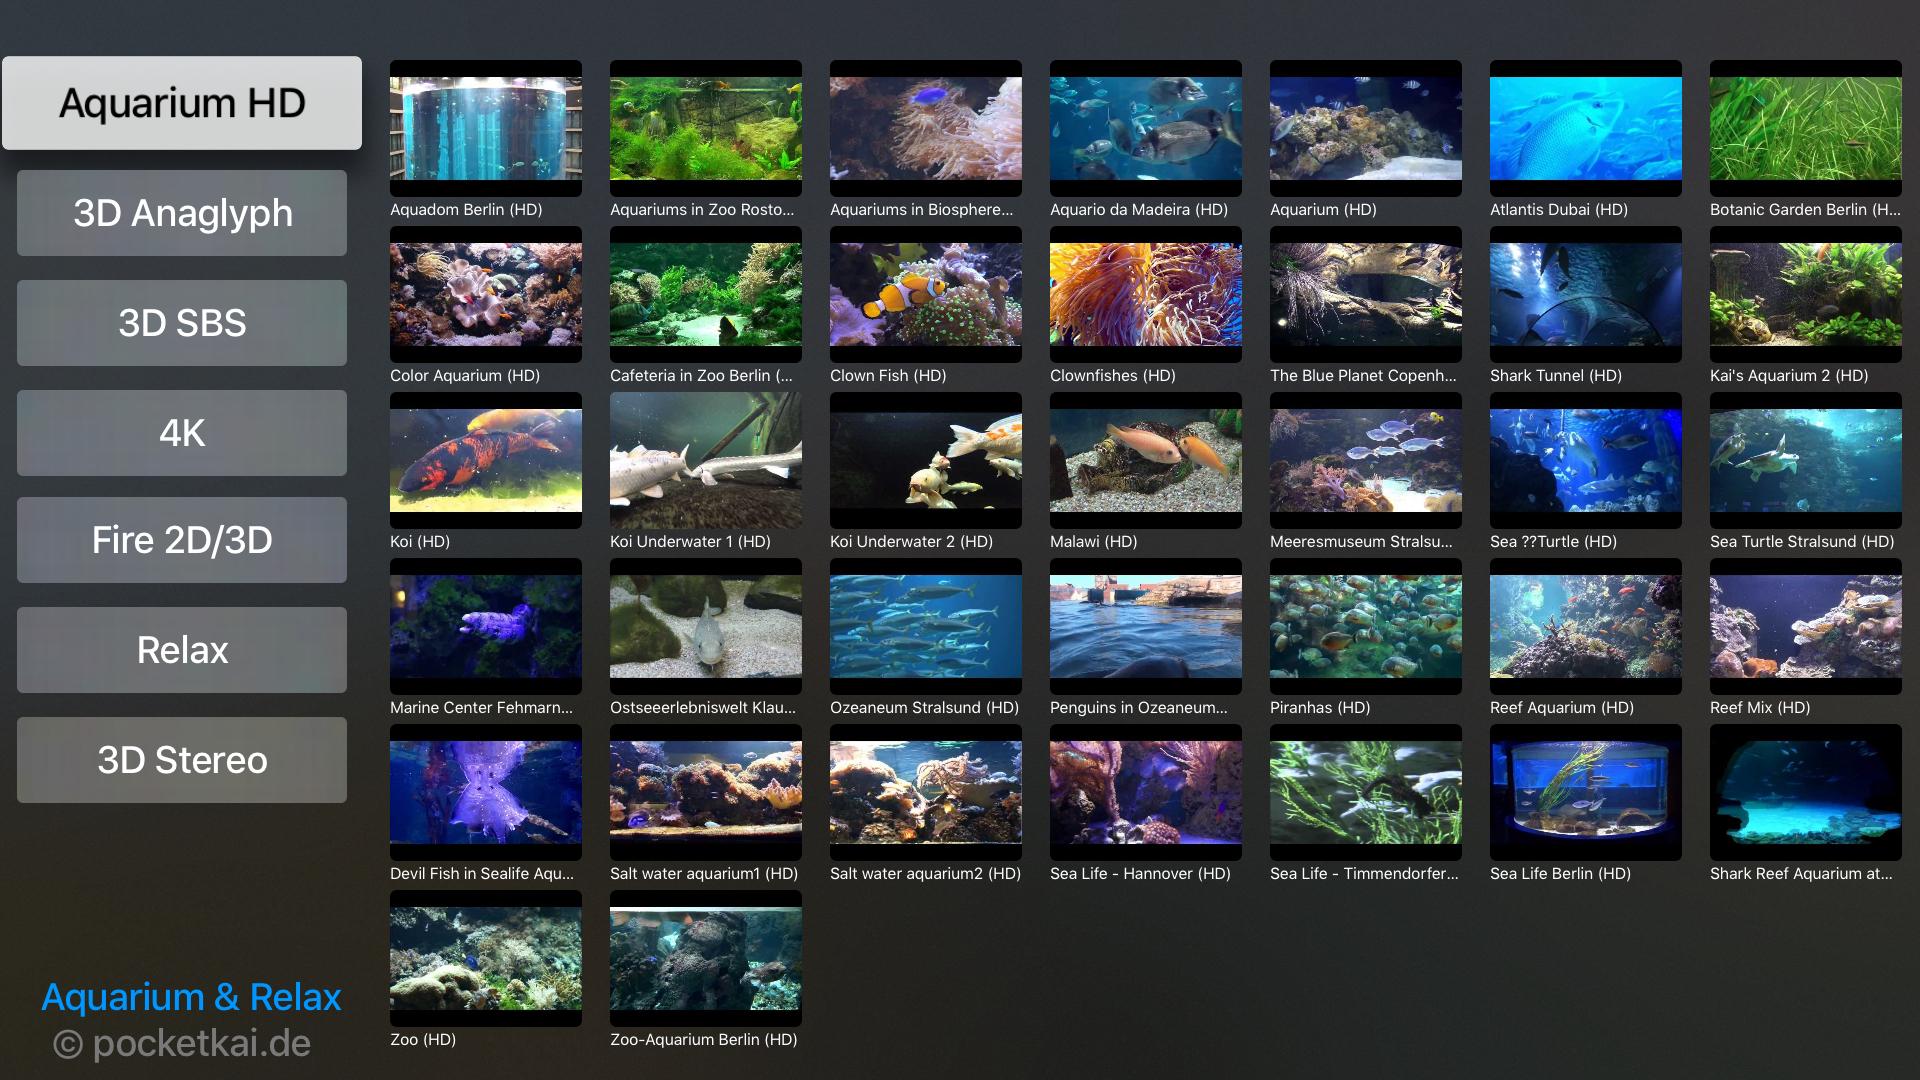 Aquarium & Relax screenshot 1